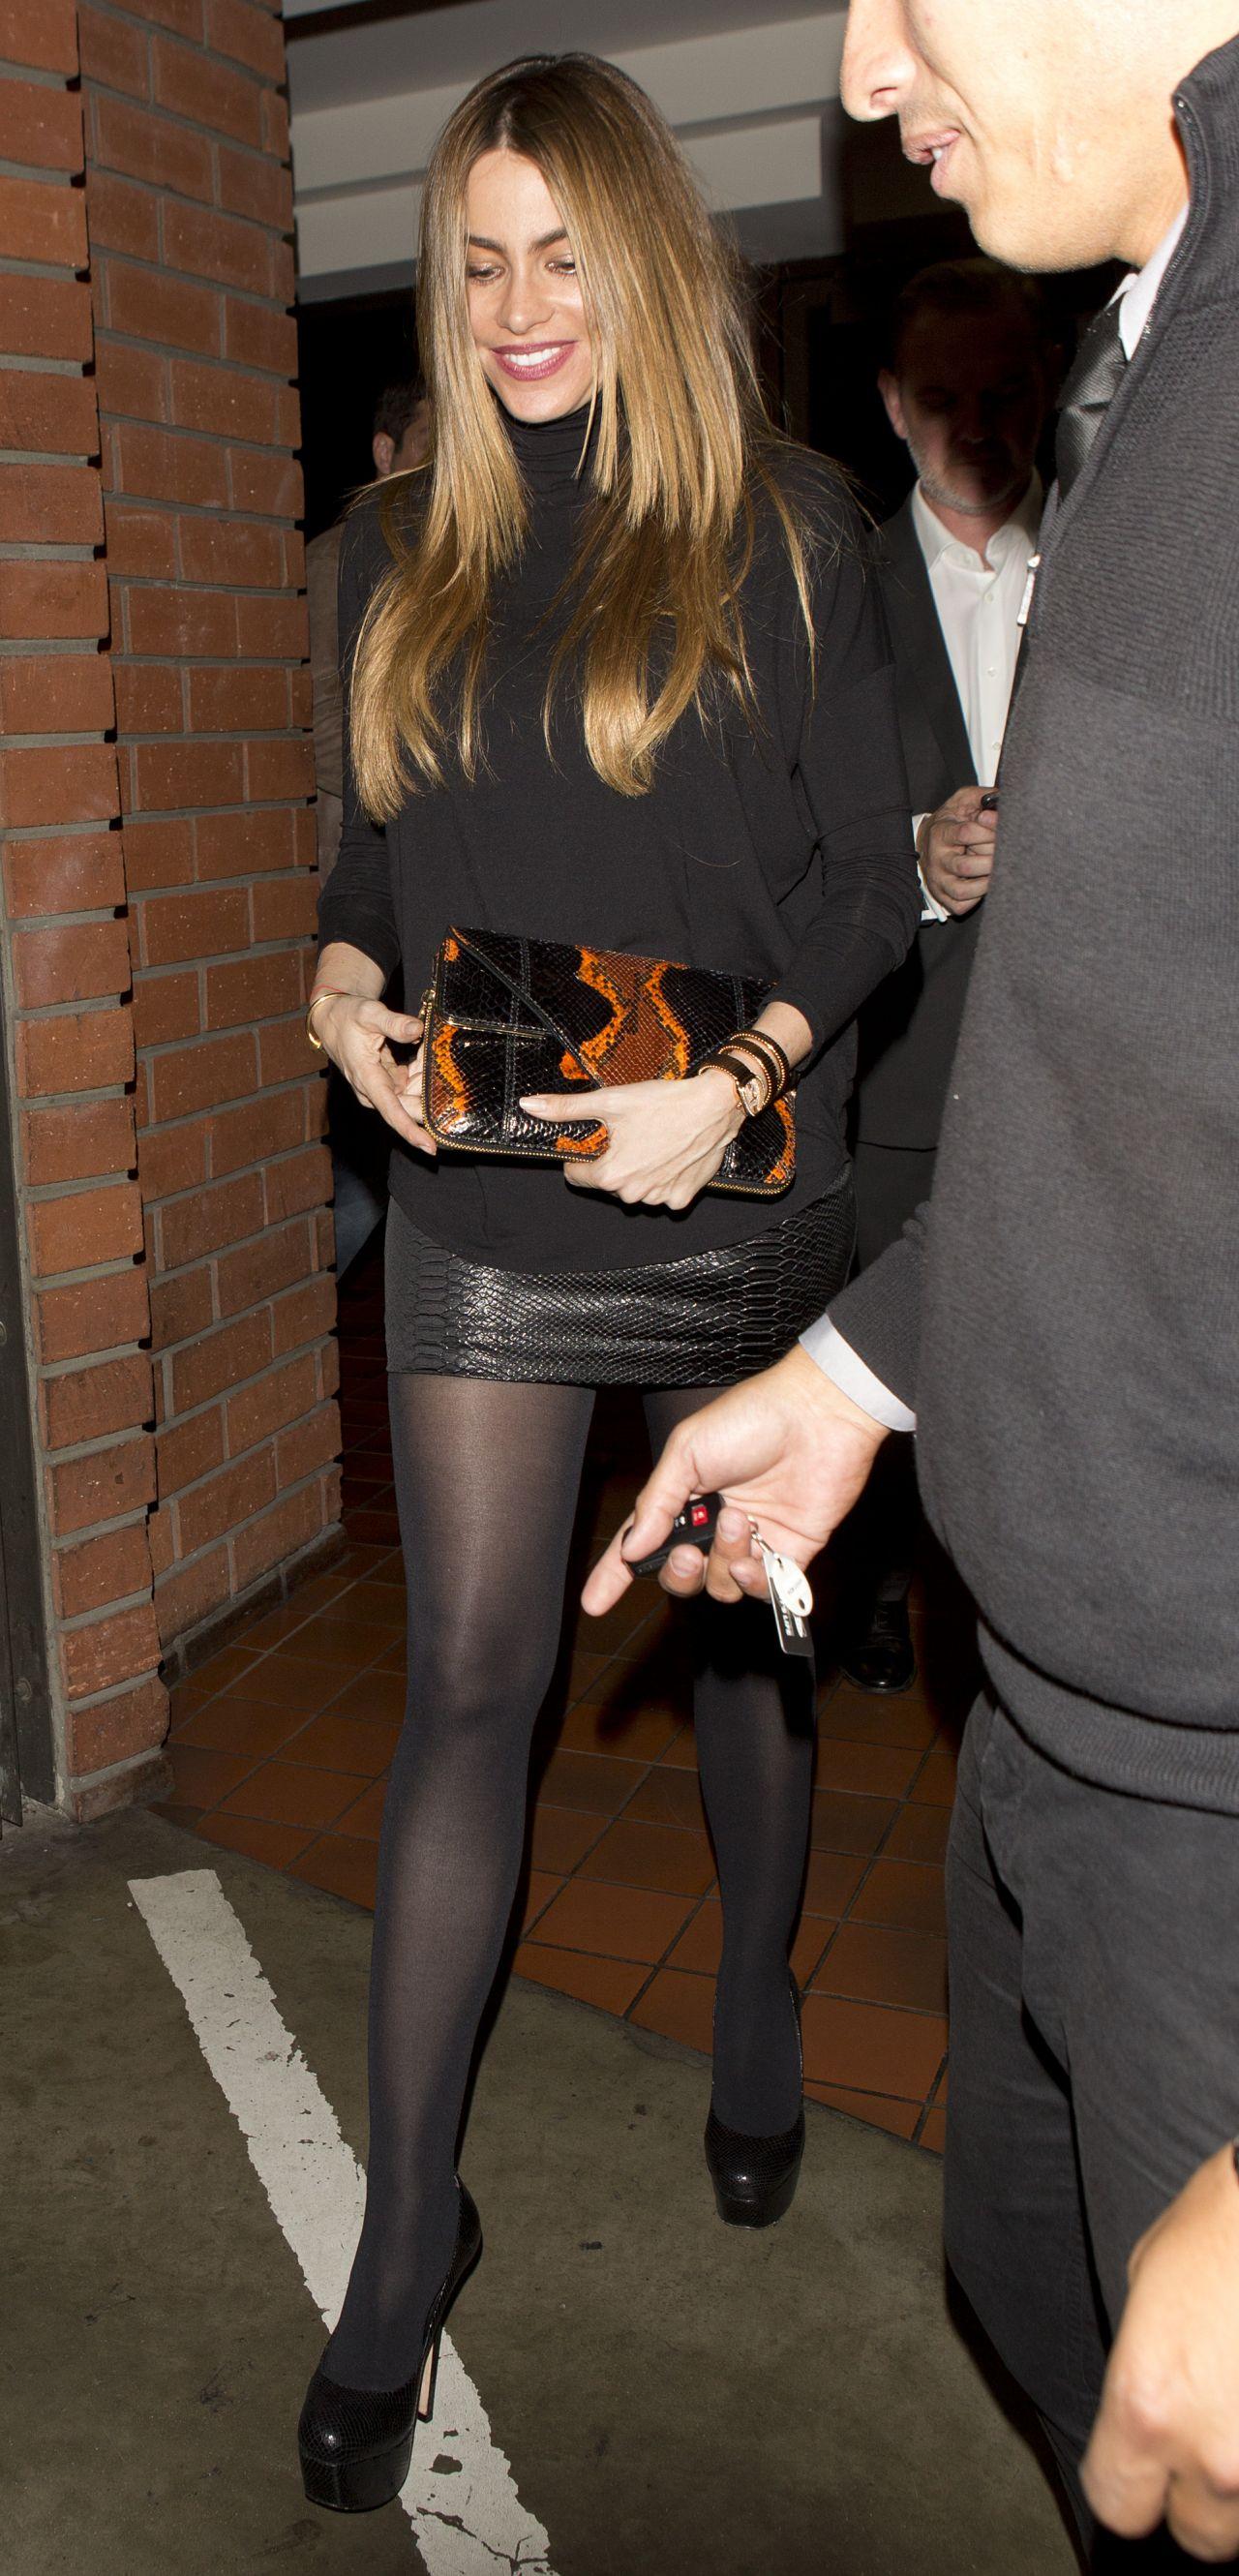 Celebrity heels pantyhose images 745